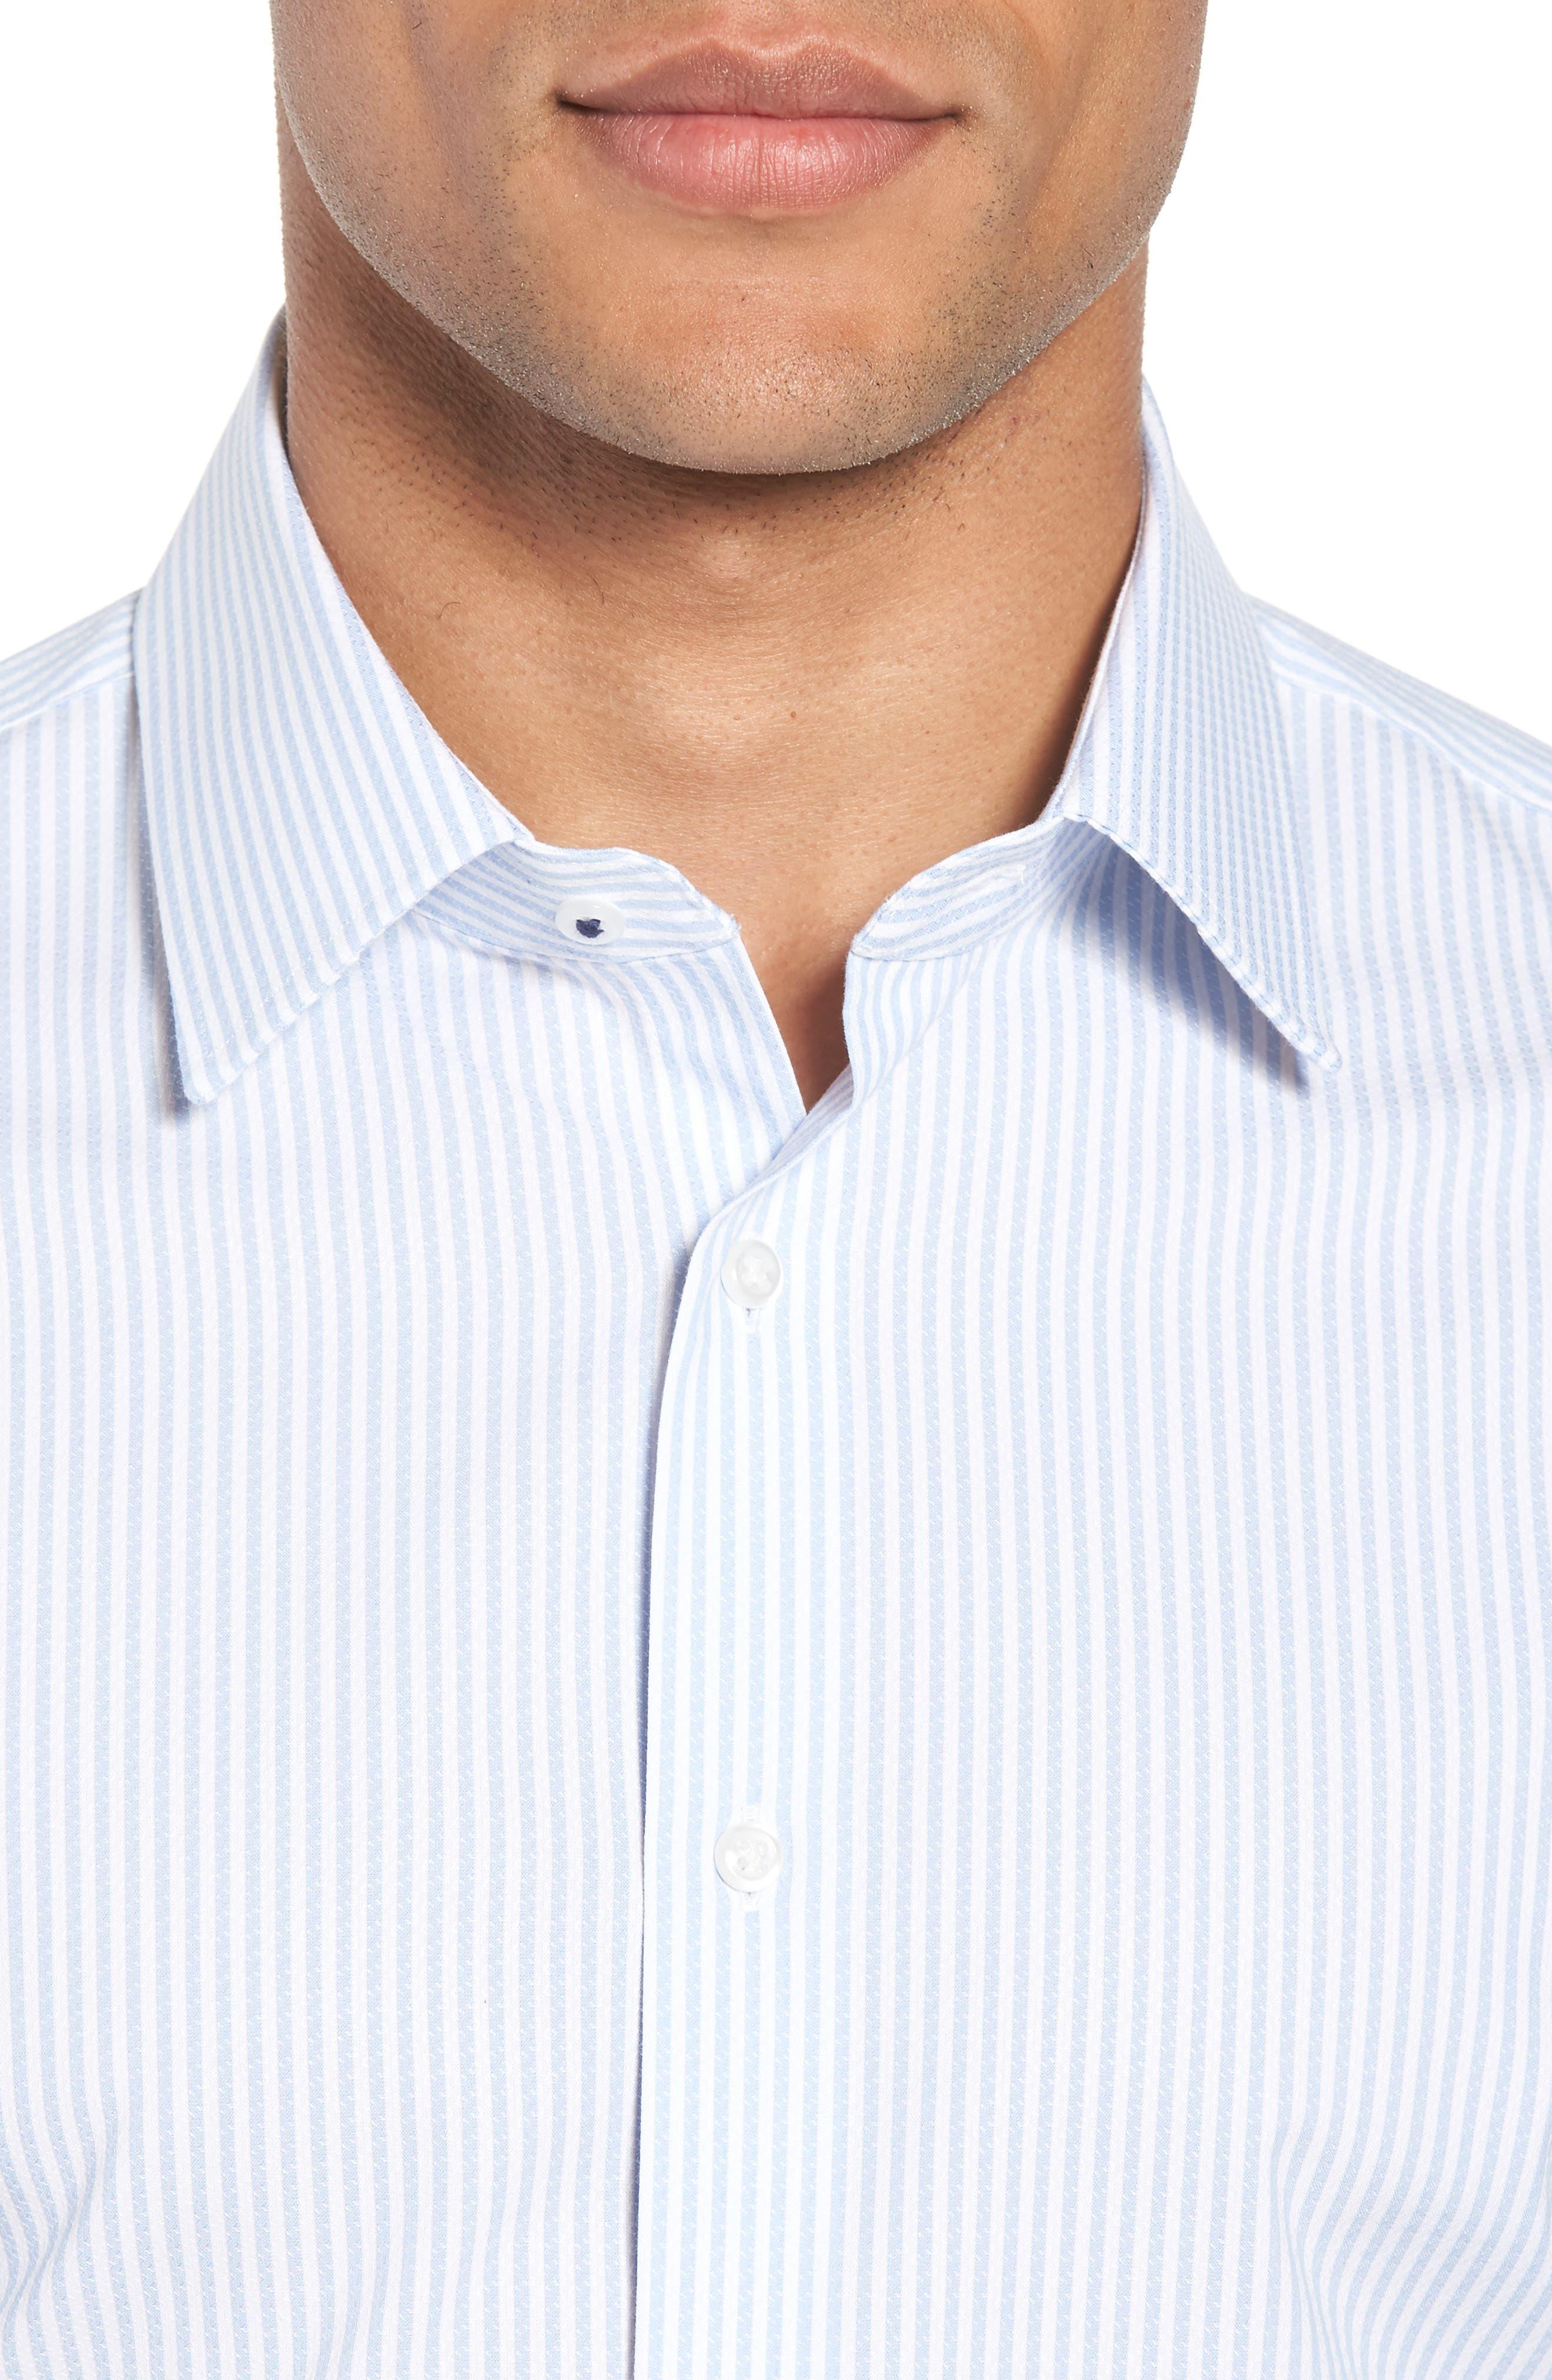 Tech-Smart Trim Fit Stripe Stretch Dress Shirt,                             Alternate thumbnail 2, color,                             Blue Brunnera